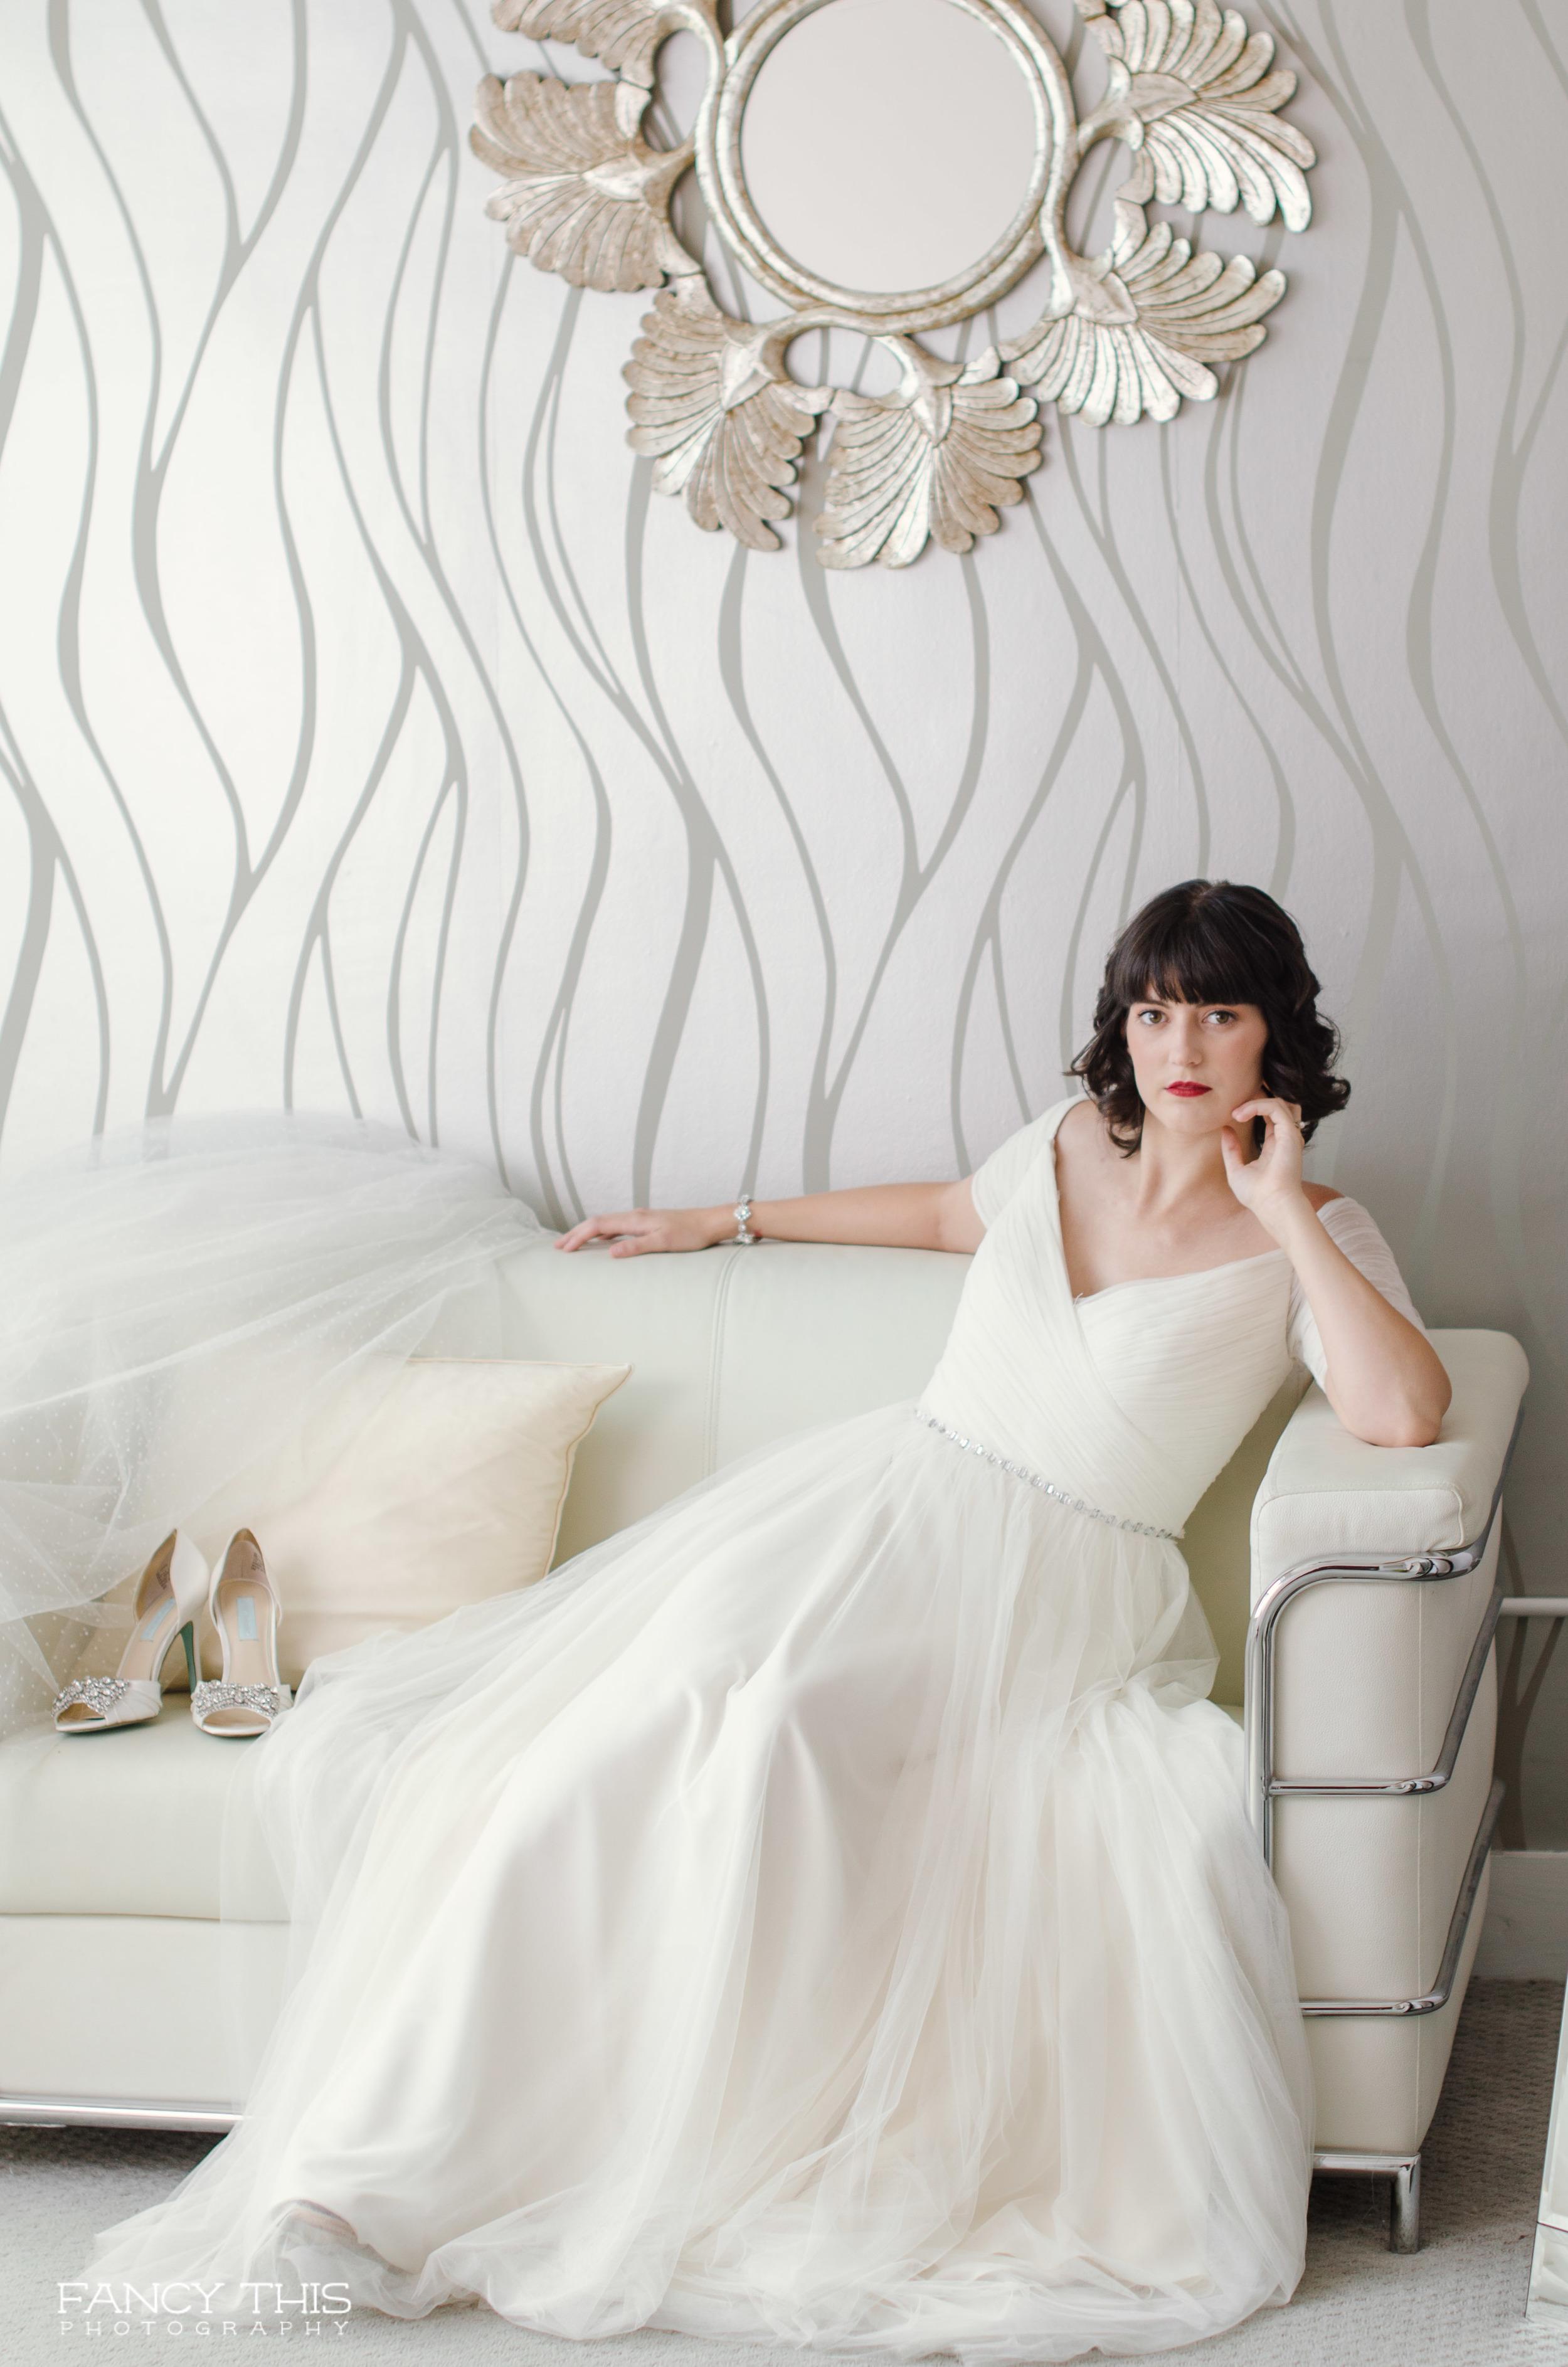 joy_bridal-2.jpg